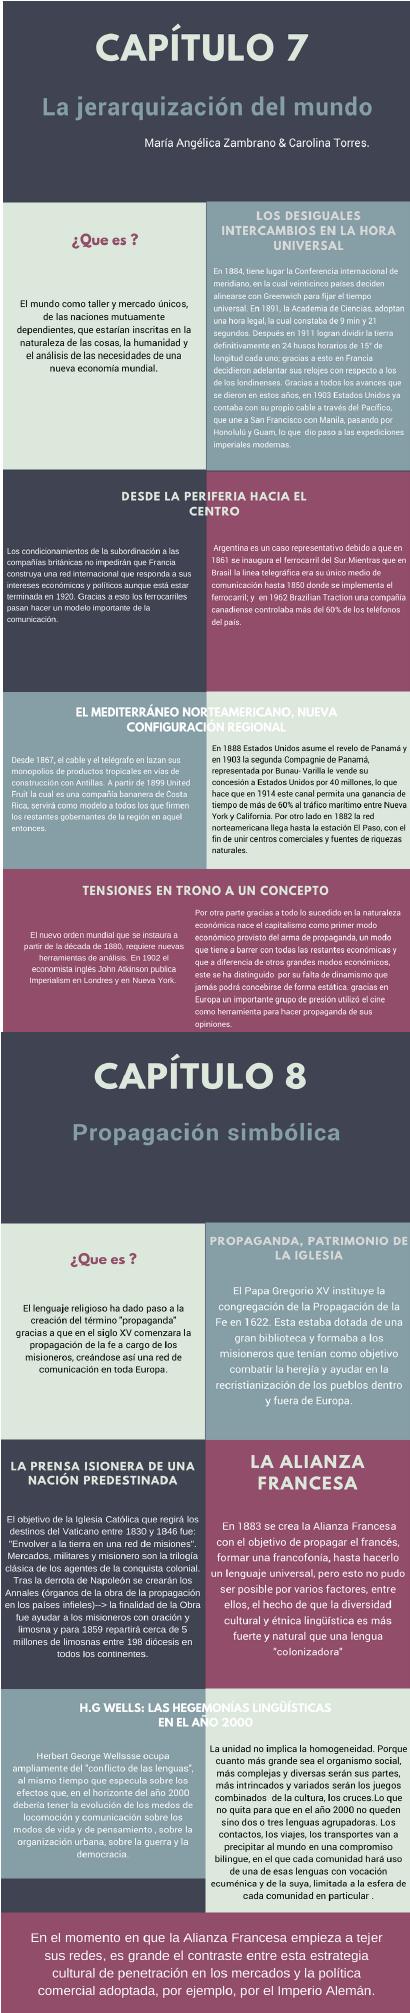 Zambrano-Torres 2.png